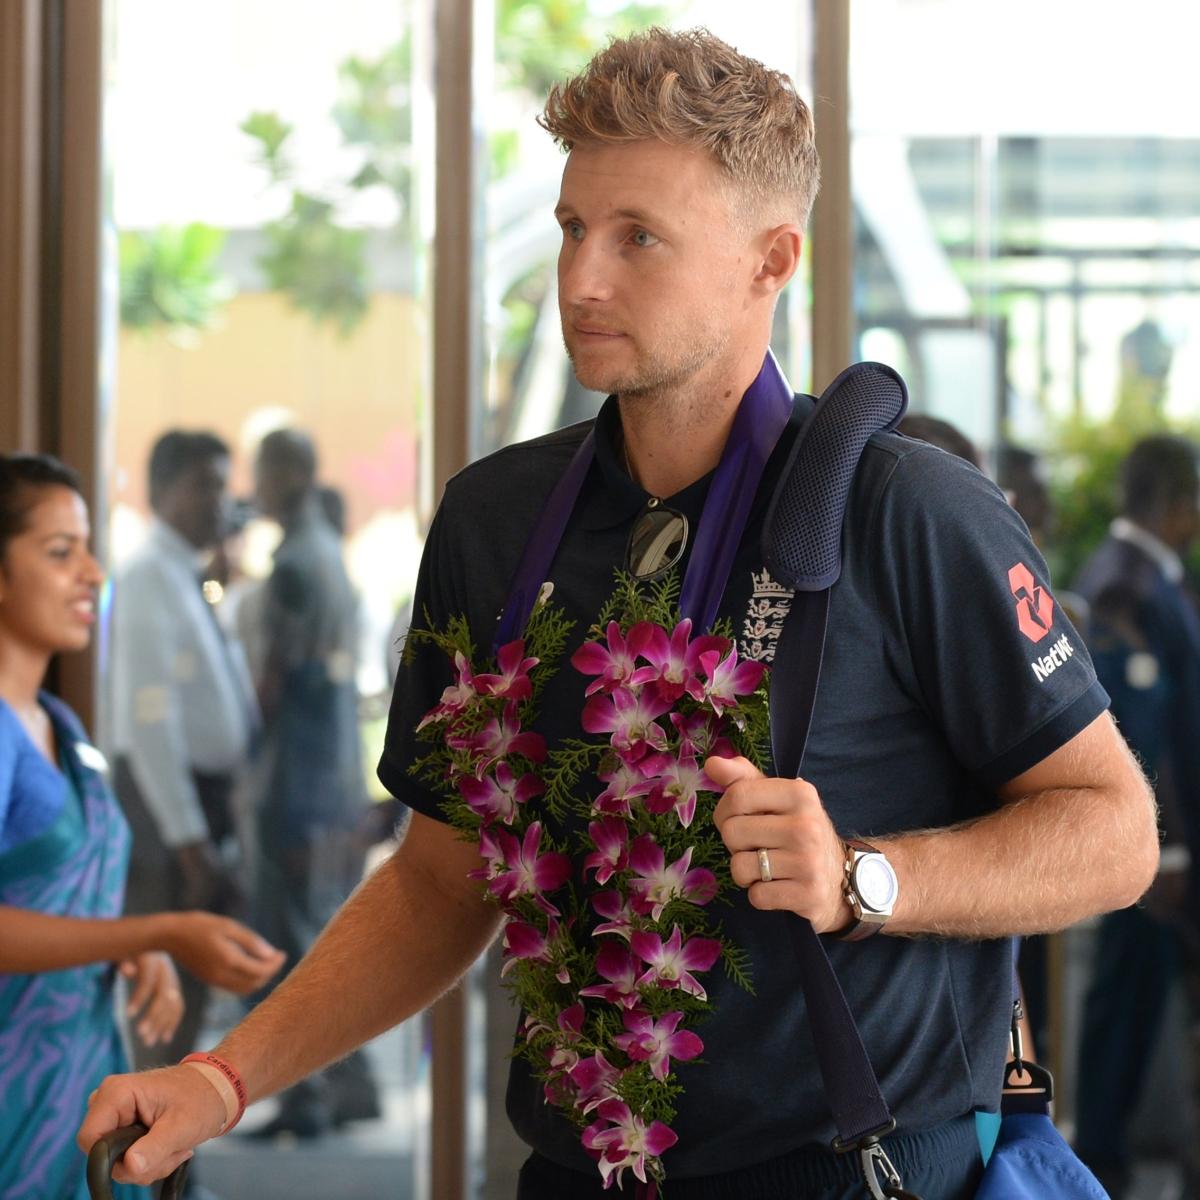 Joe Root says  England players won't shake hands with Sri Lanka cricketers to avoid Coronavirus